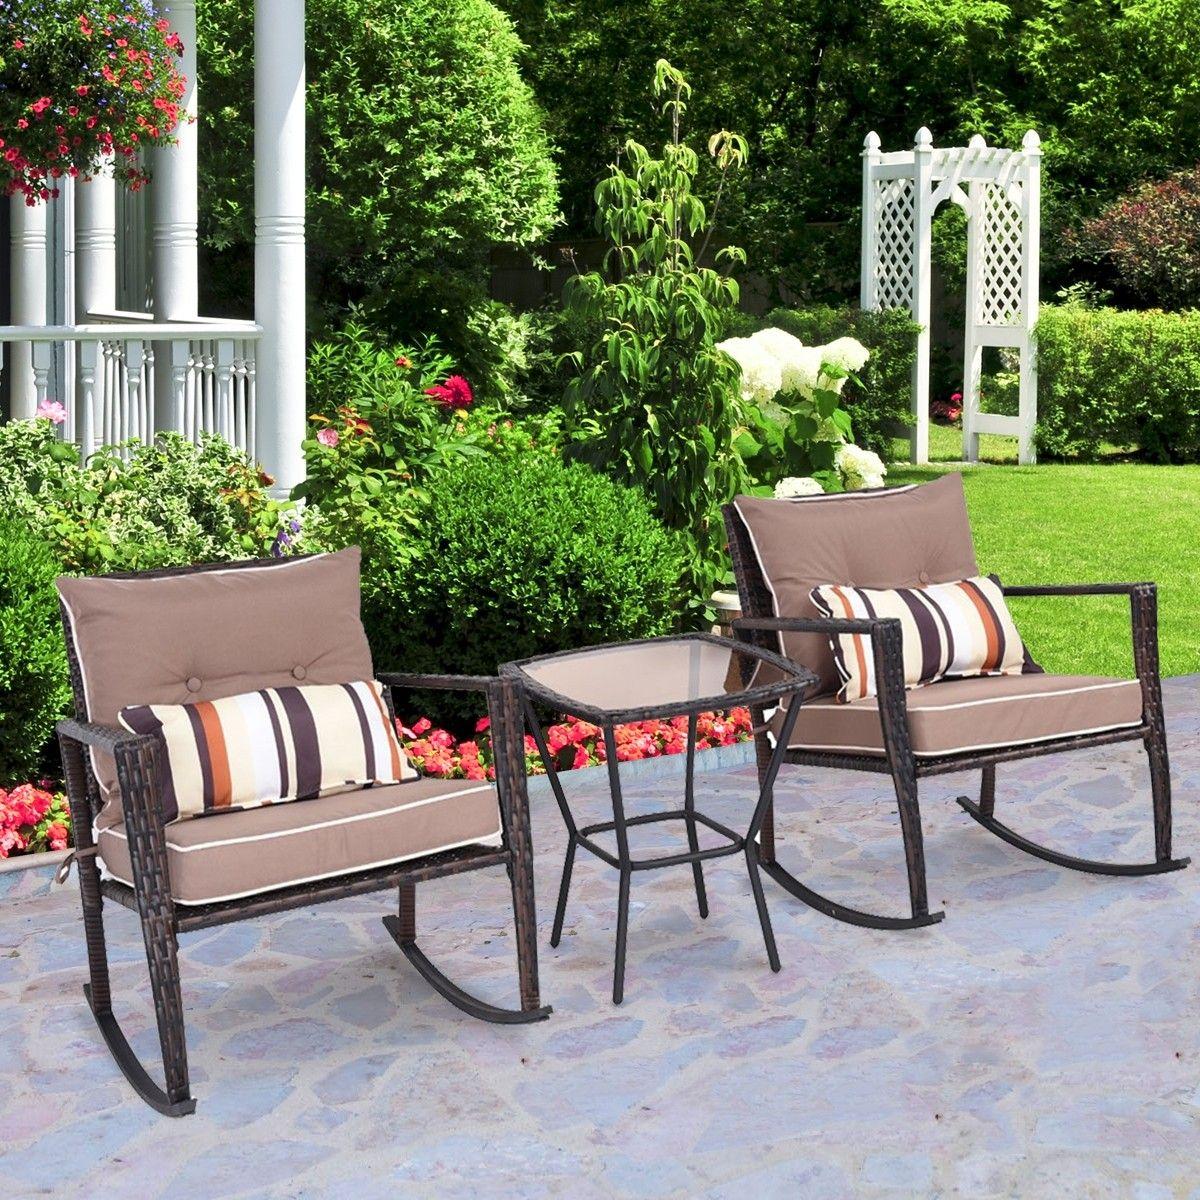 3 Pcs Patio Rattan Wicker Furniture Set Rocking Chair Coffee Table